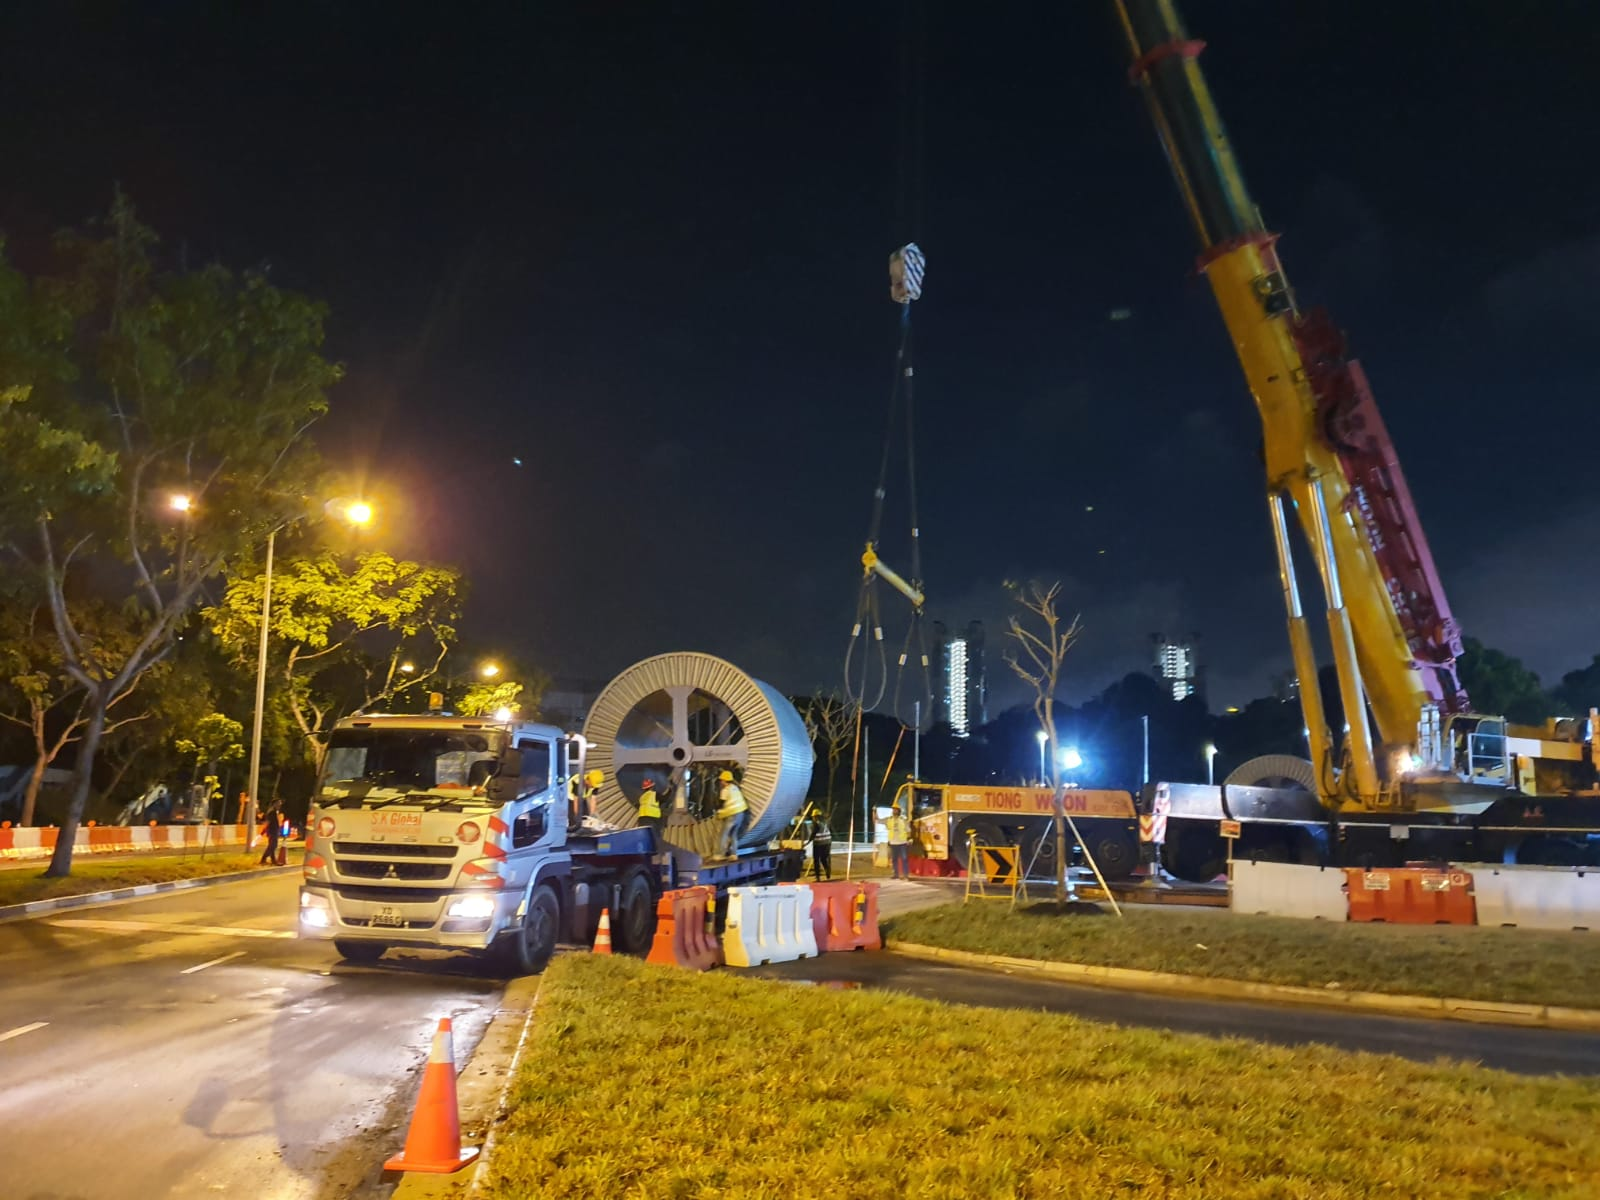 Loading at Ayer Rajah Power Station 7 - Securing and lashing onto chassis